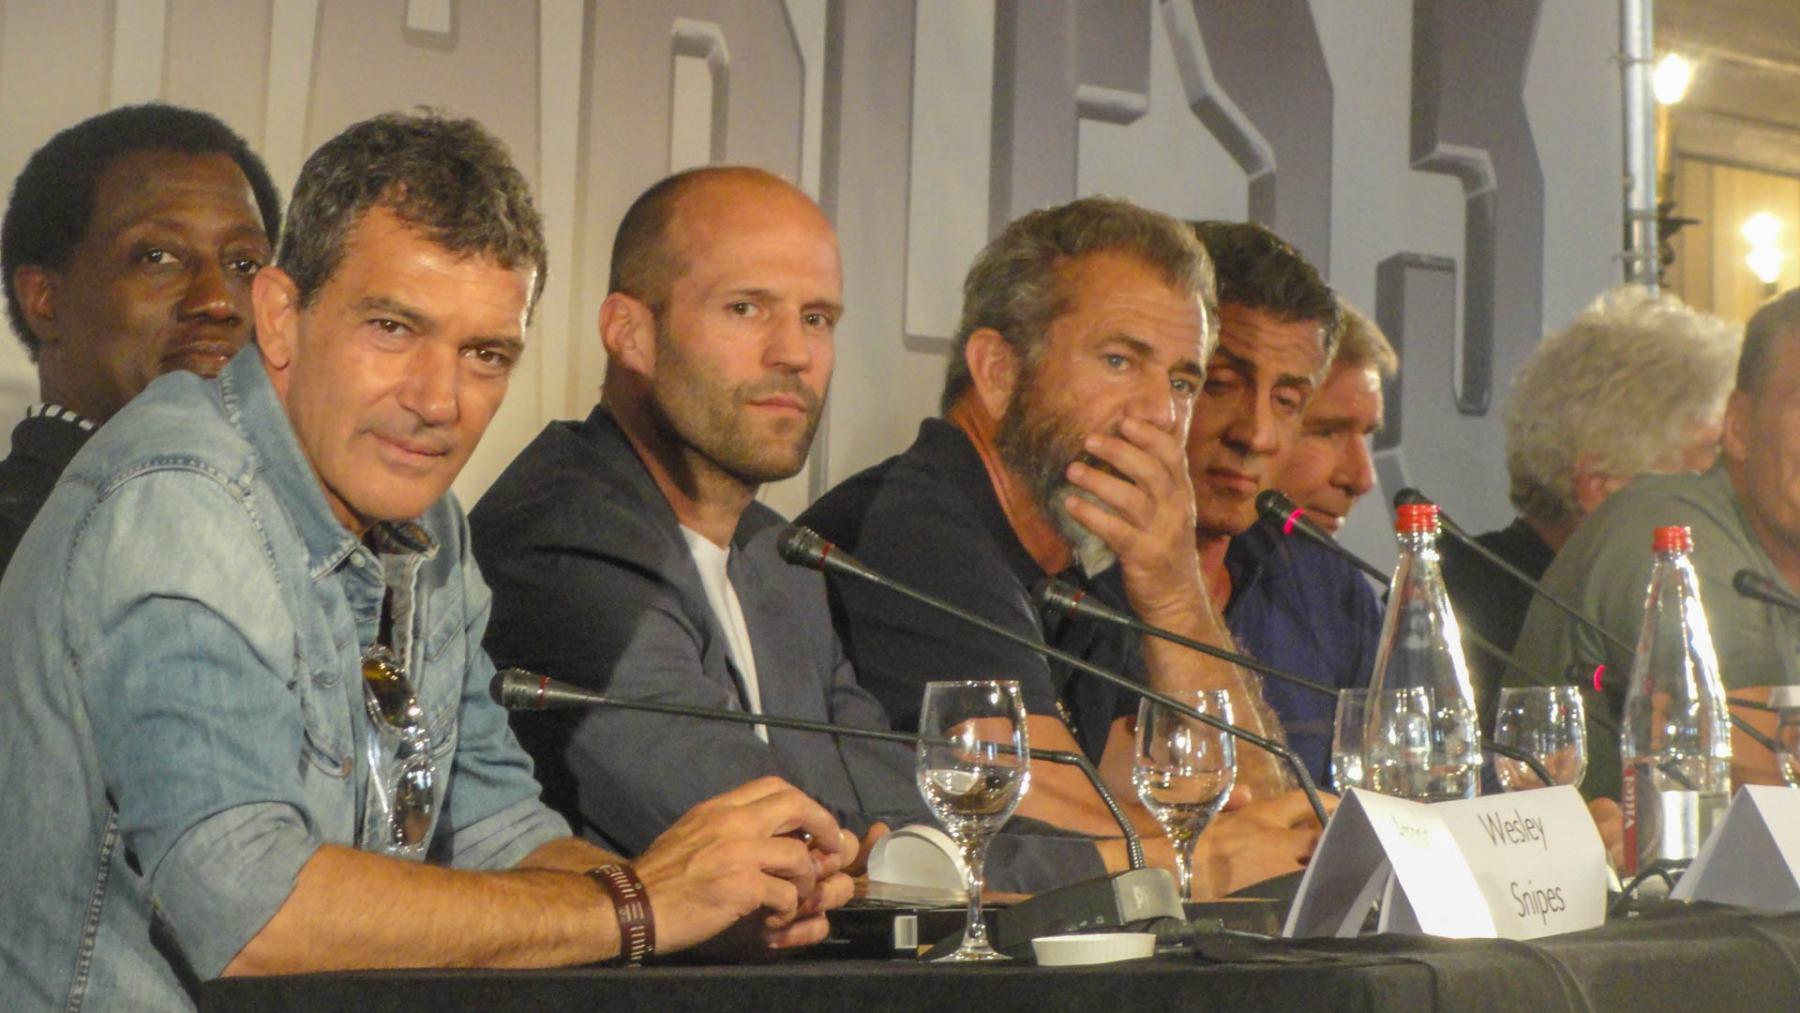 Decibel06 - Conférence de presse - Expendables FESTIVAL de CANNES - Stallone - Snipes - Banderas - Statham - Gibson